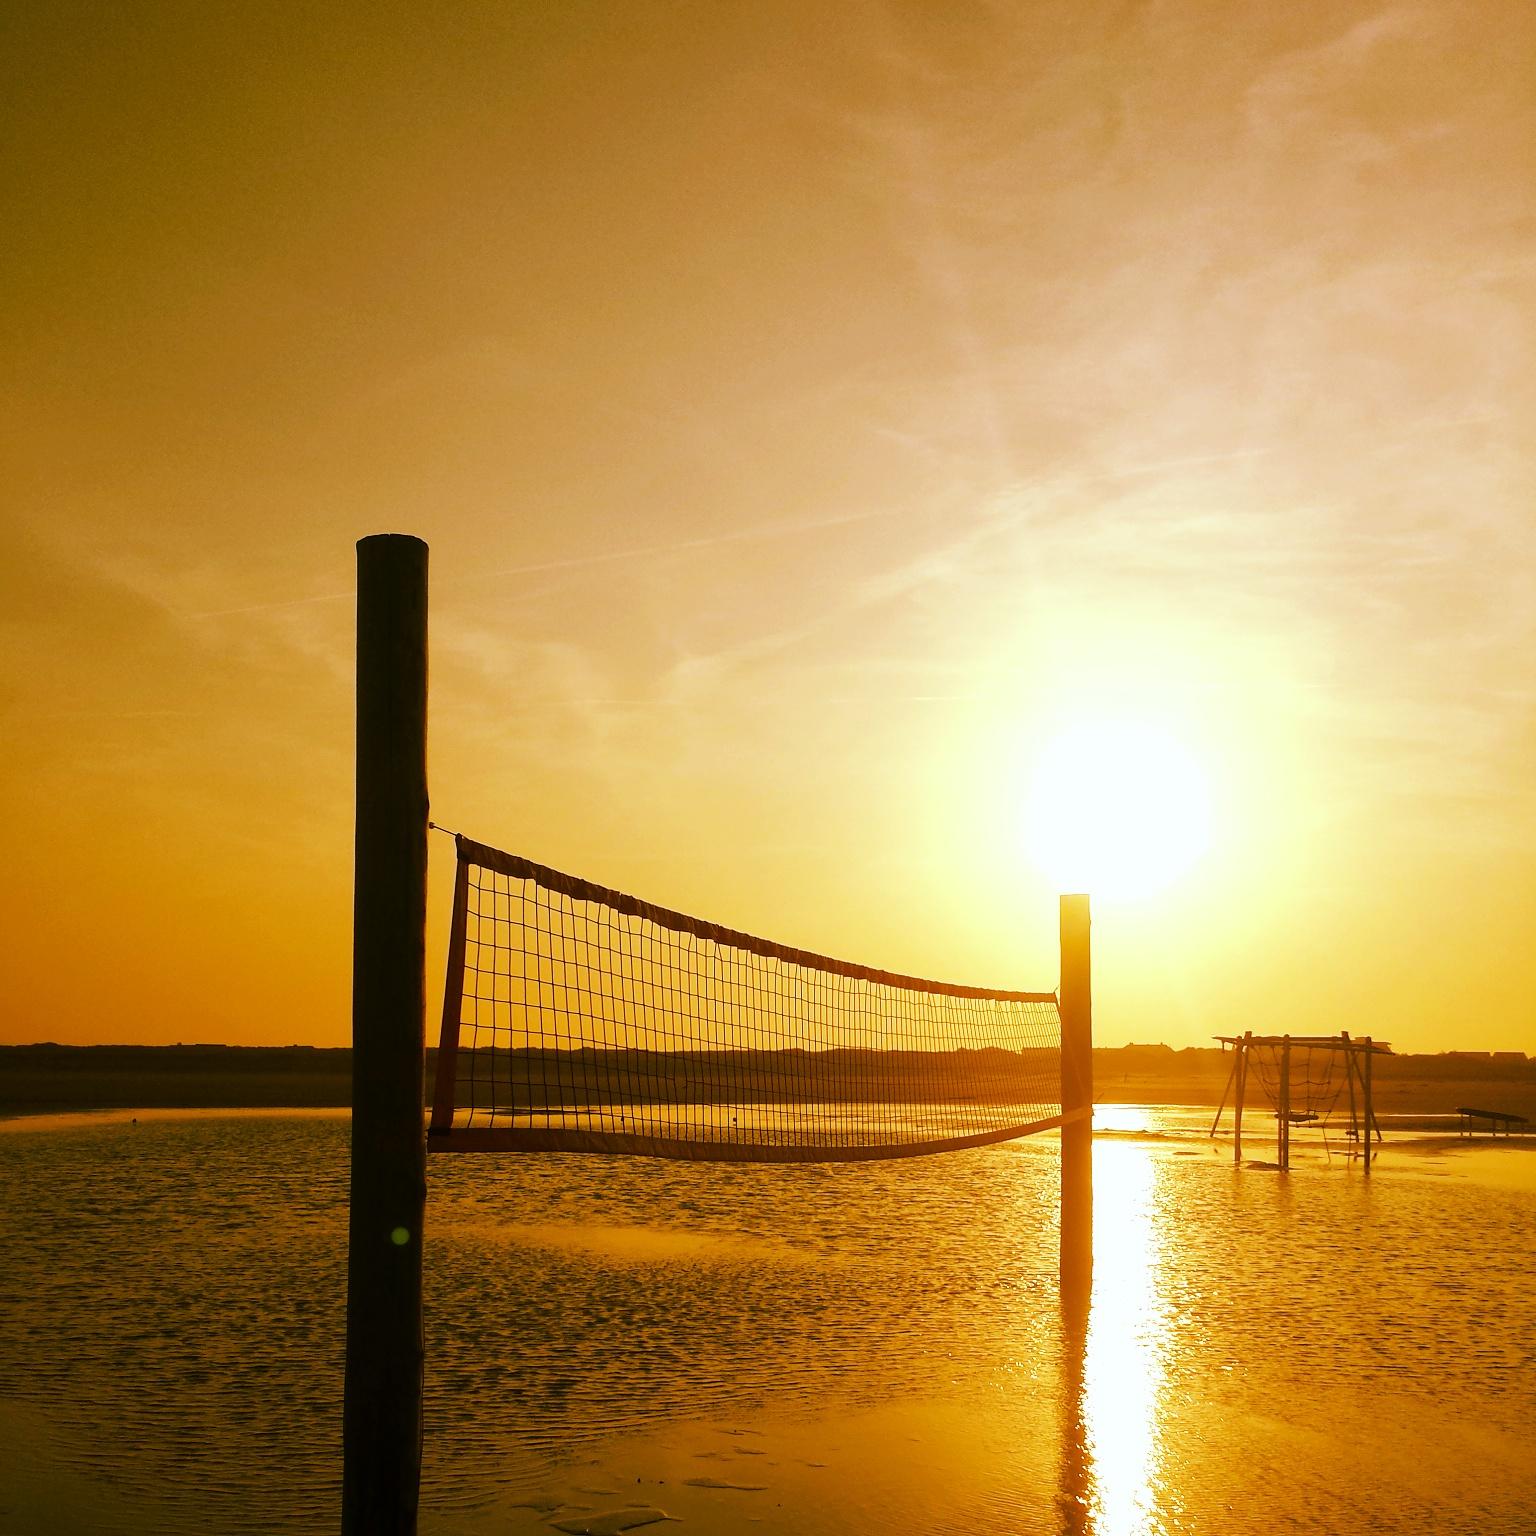 Sonnenaufgang, Volleyball